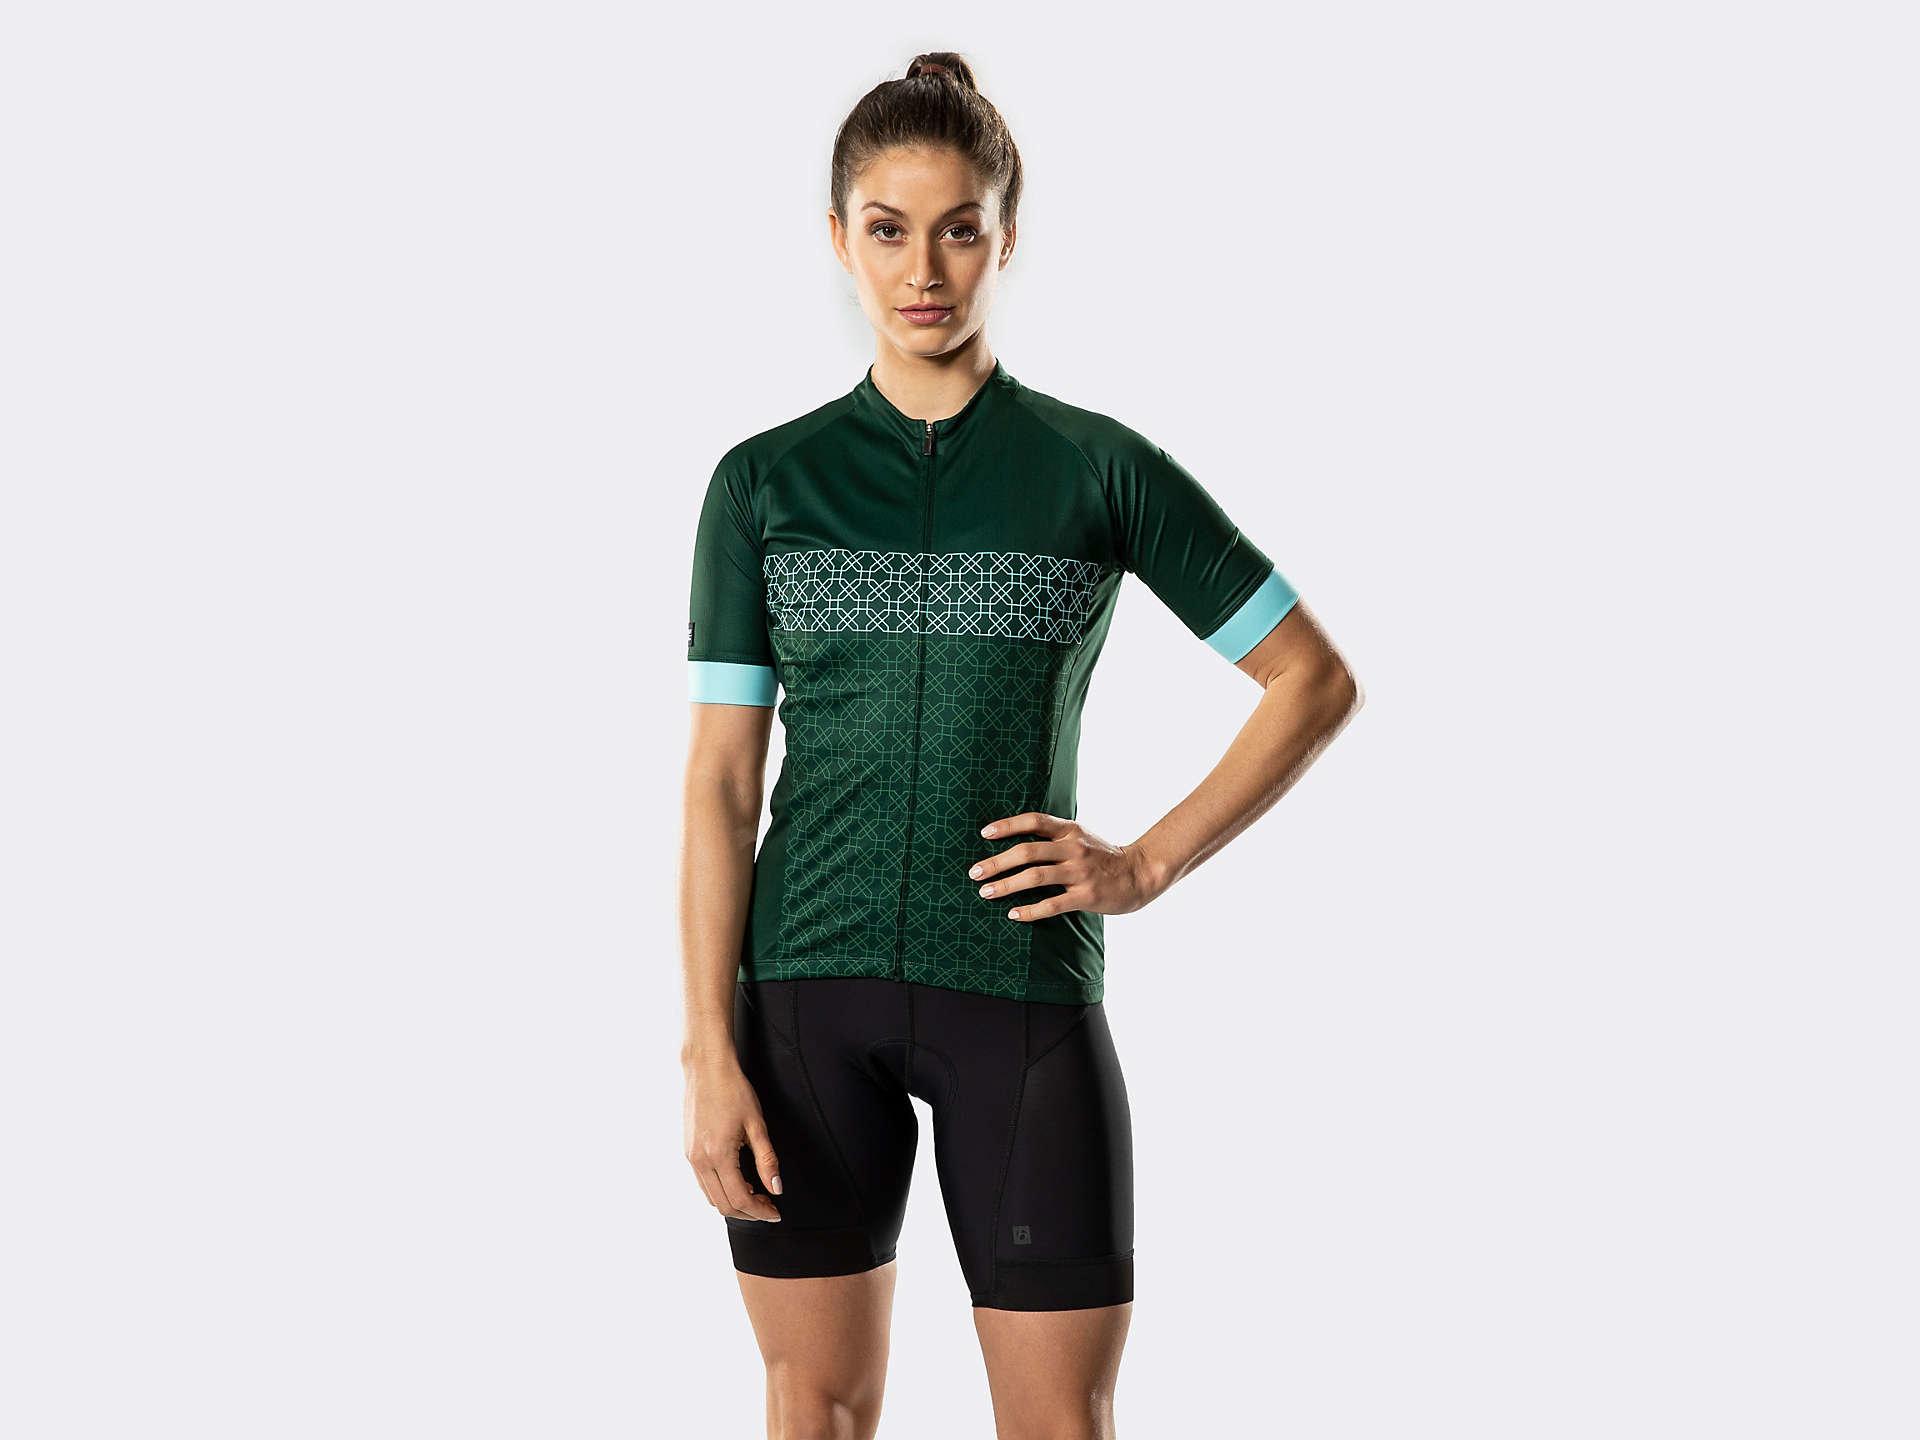 86336080 Bontrager Anara LTD Women's Cycling Jersey - Massachusetts Bike Shop ...